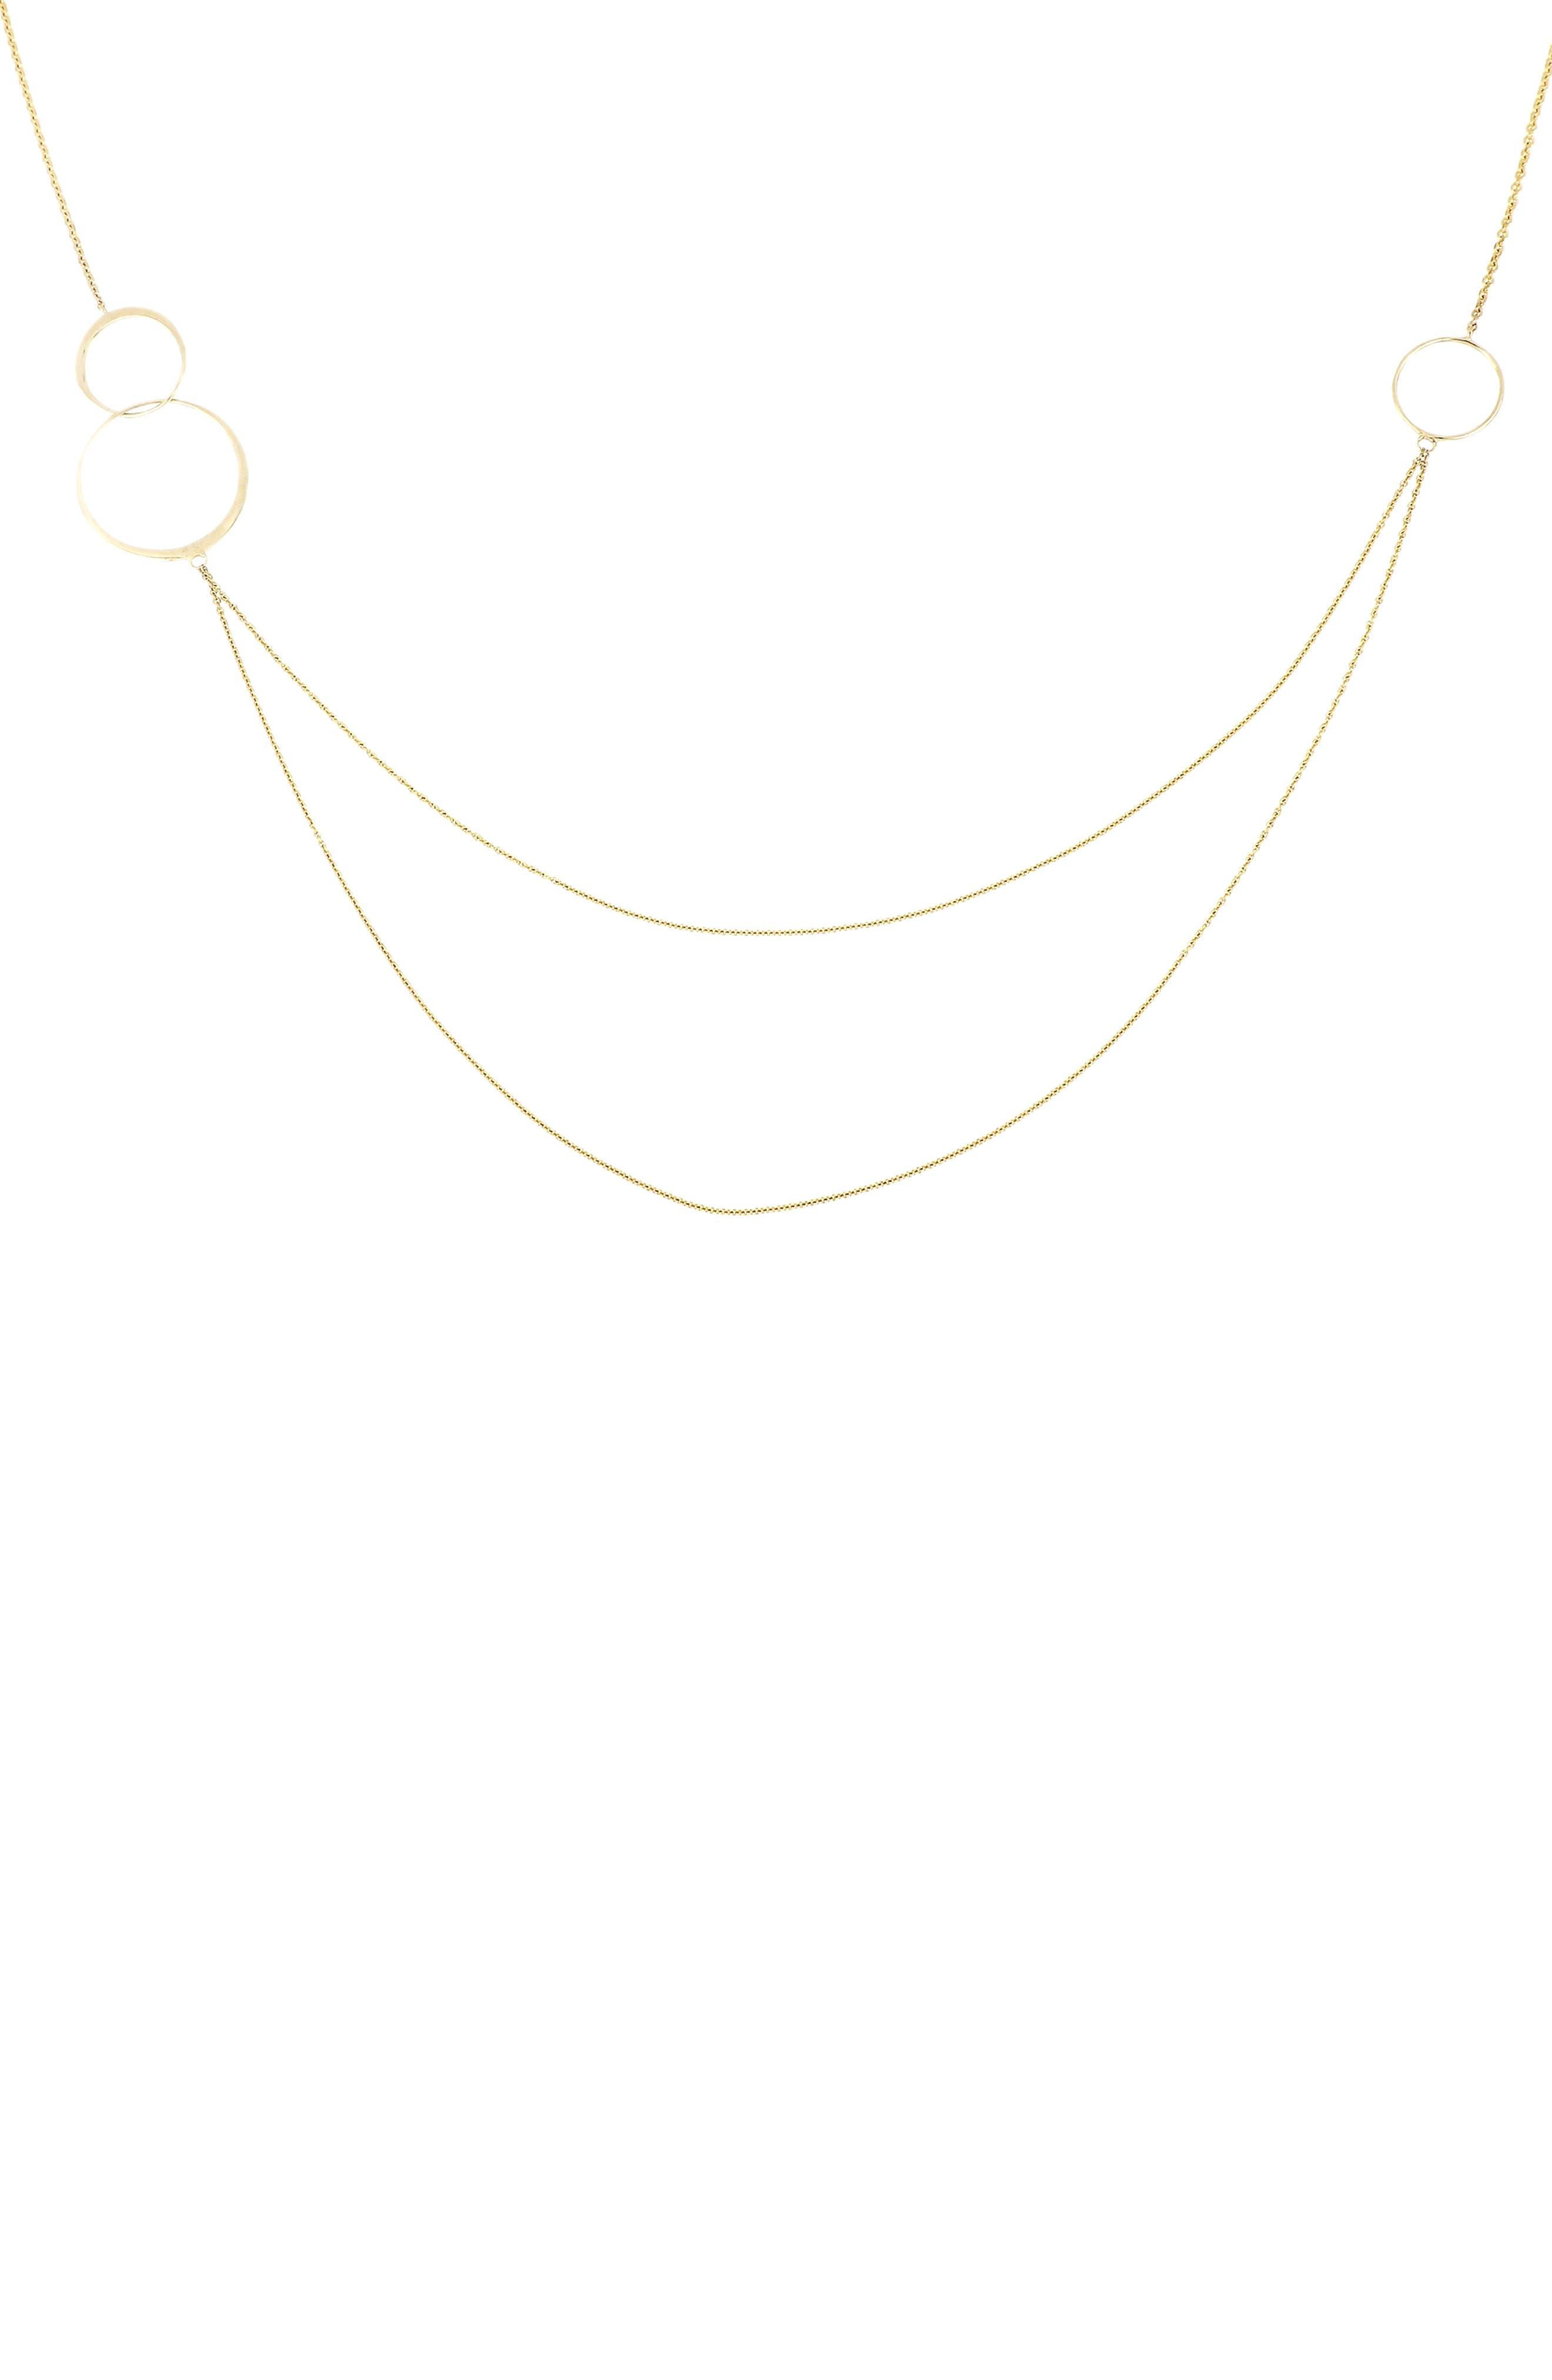 Circle Trio Layered Necklace,                             Main thumbnail 1, color,                             YELLOW GOLD